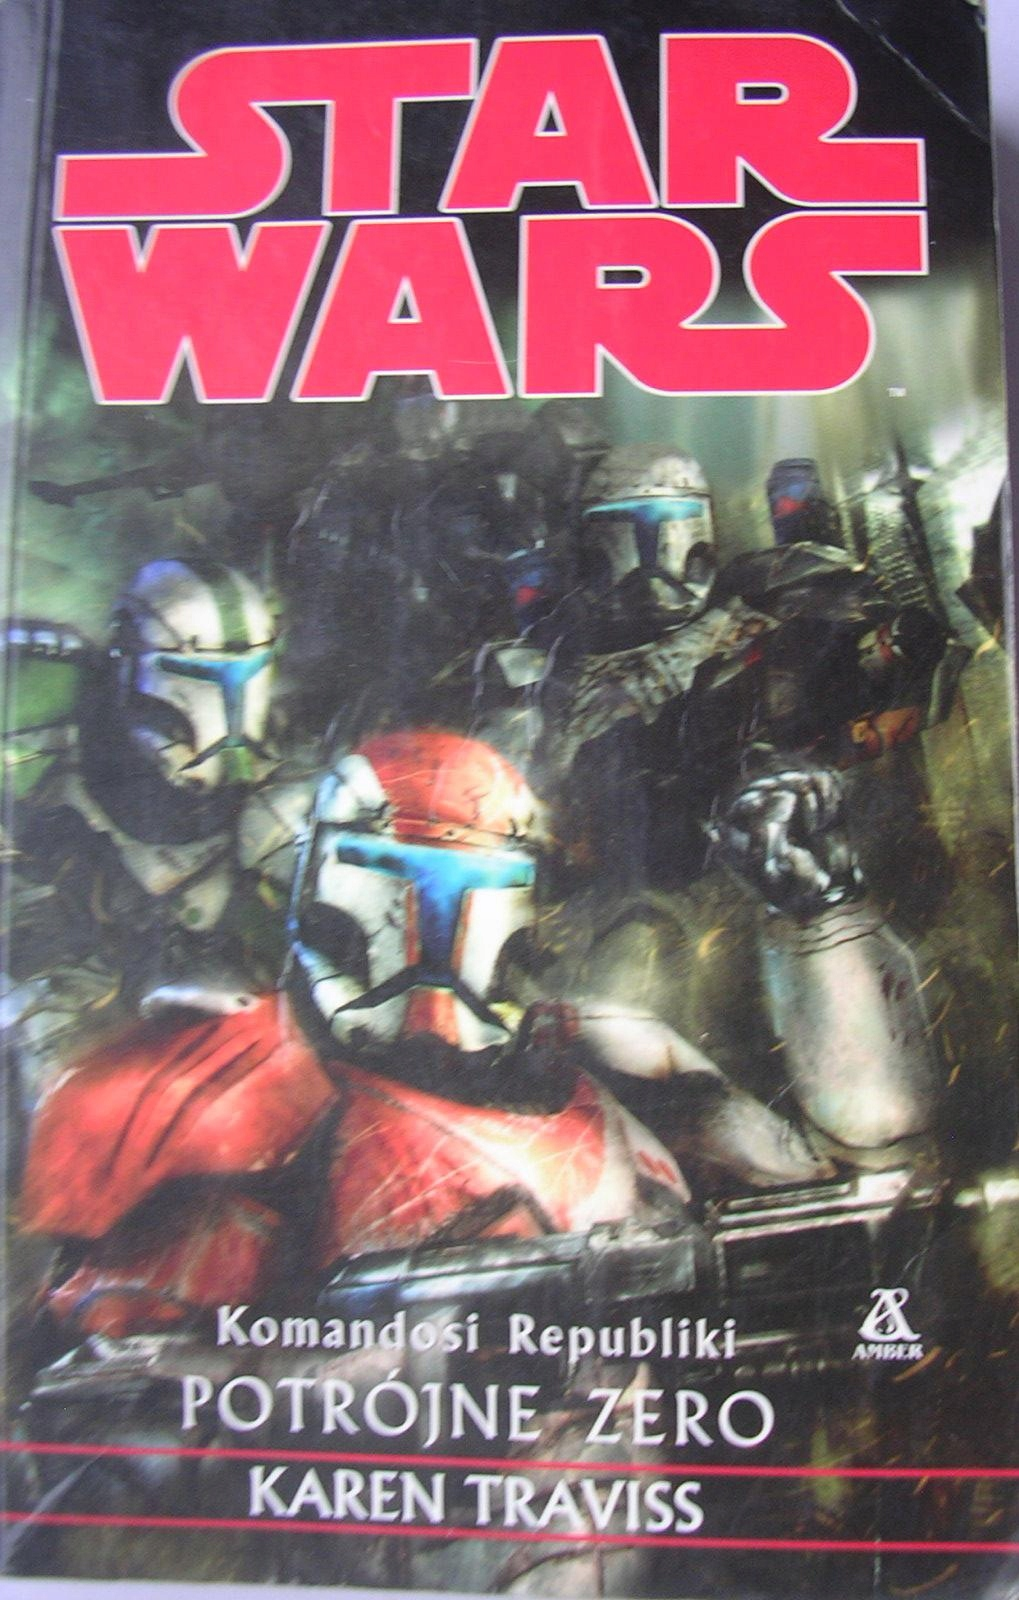 STAR WARS Komandosi republiki Potrójne Zero DB